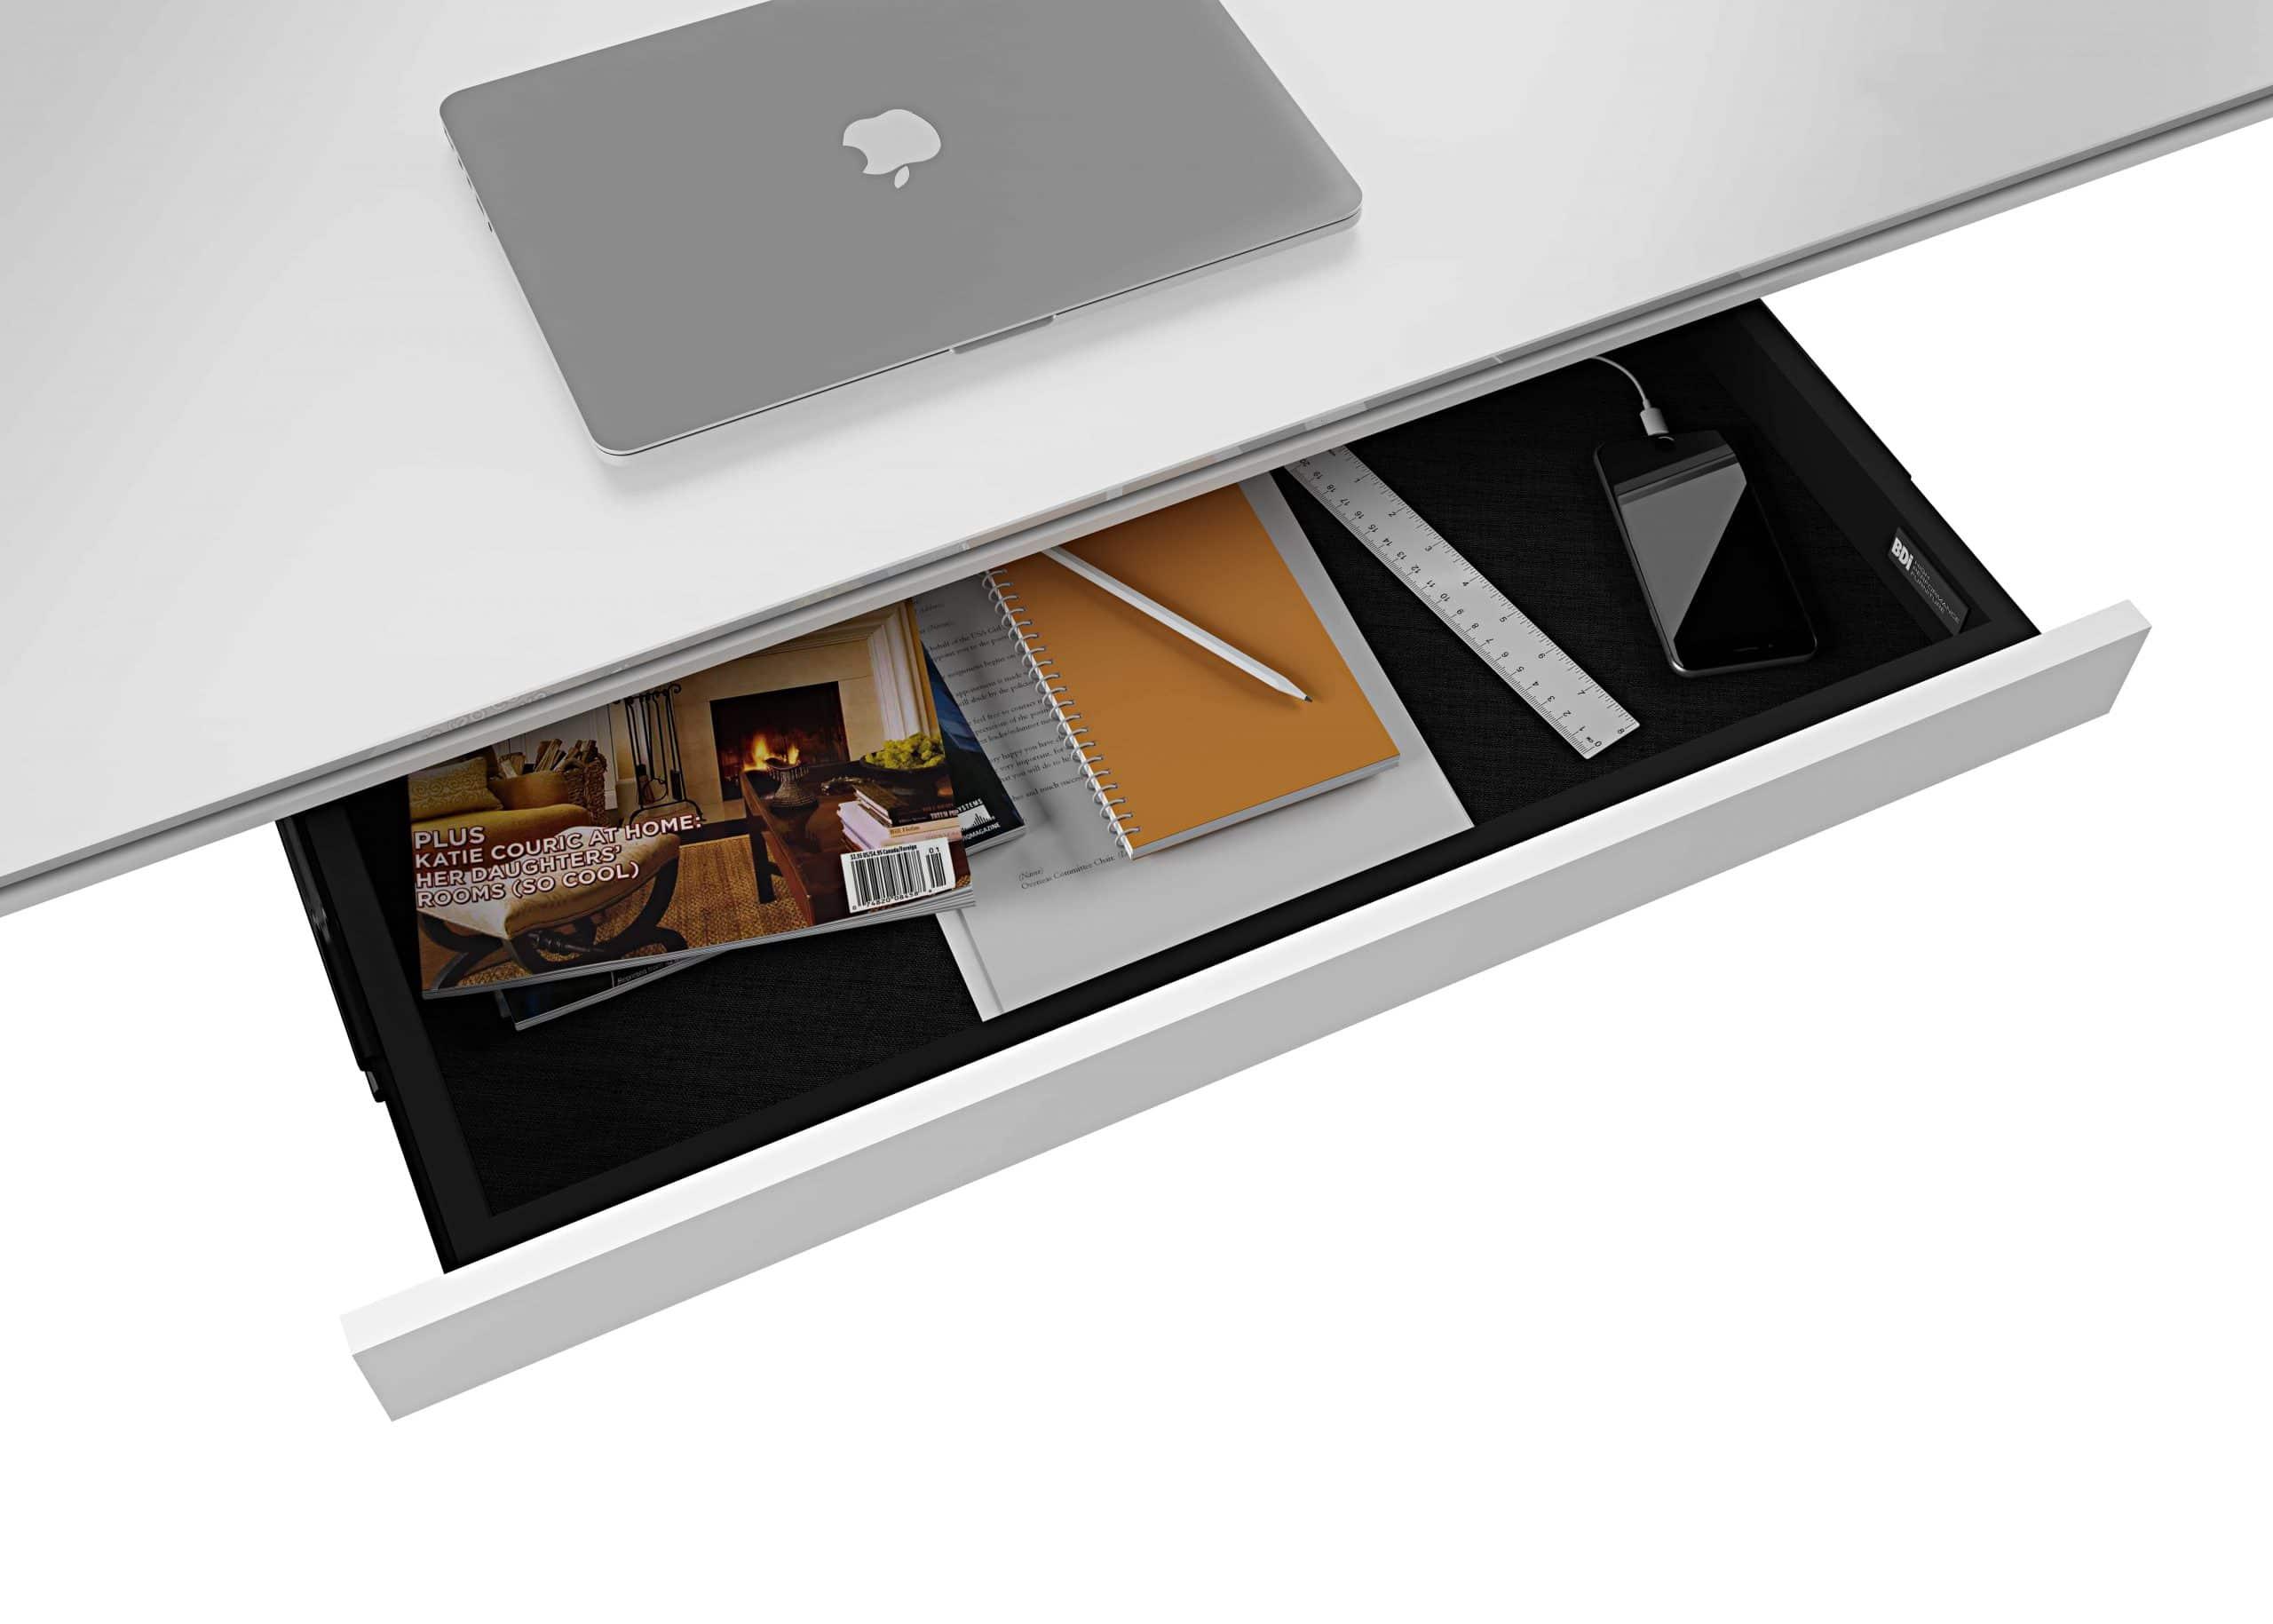 centro-office-6459-BDI-standing-desk-drawer-white-2